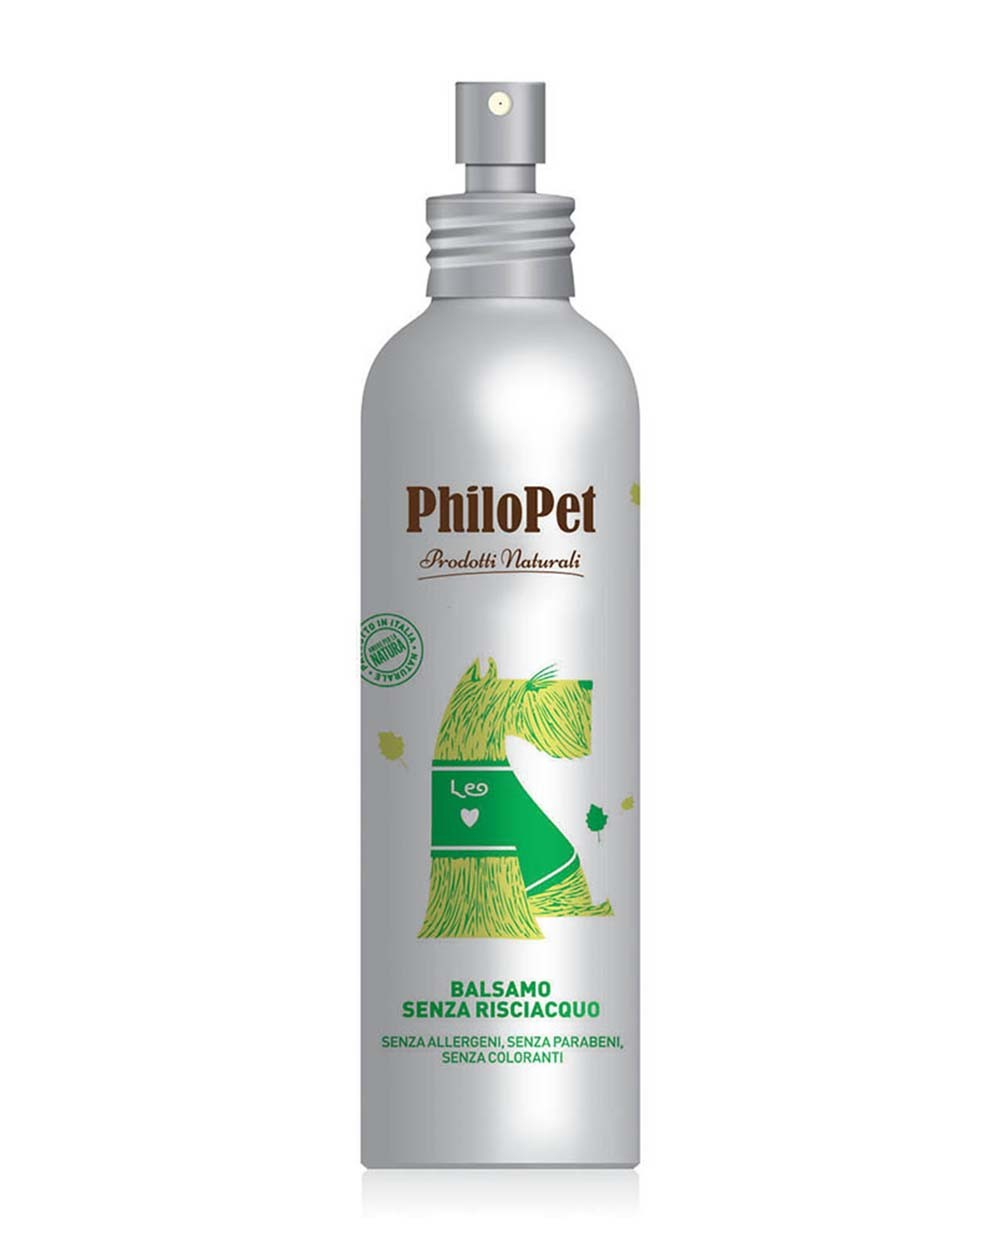 PHILOPET No-Rinse Conditioning Spray, 250 ml Siciliana.lt